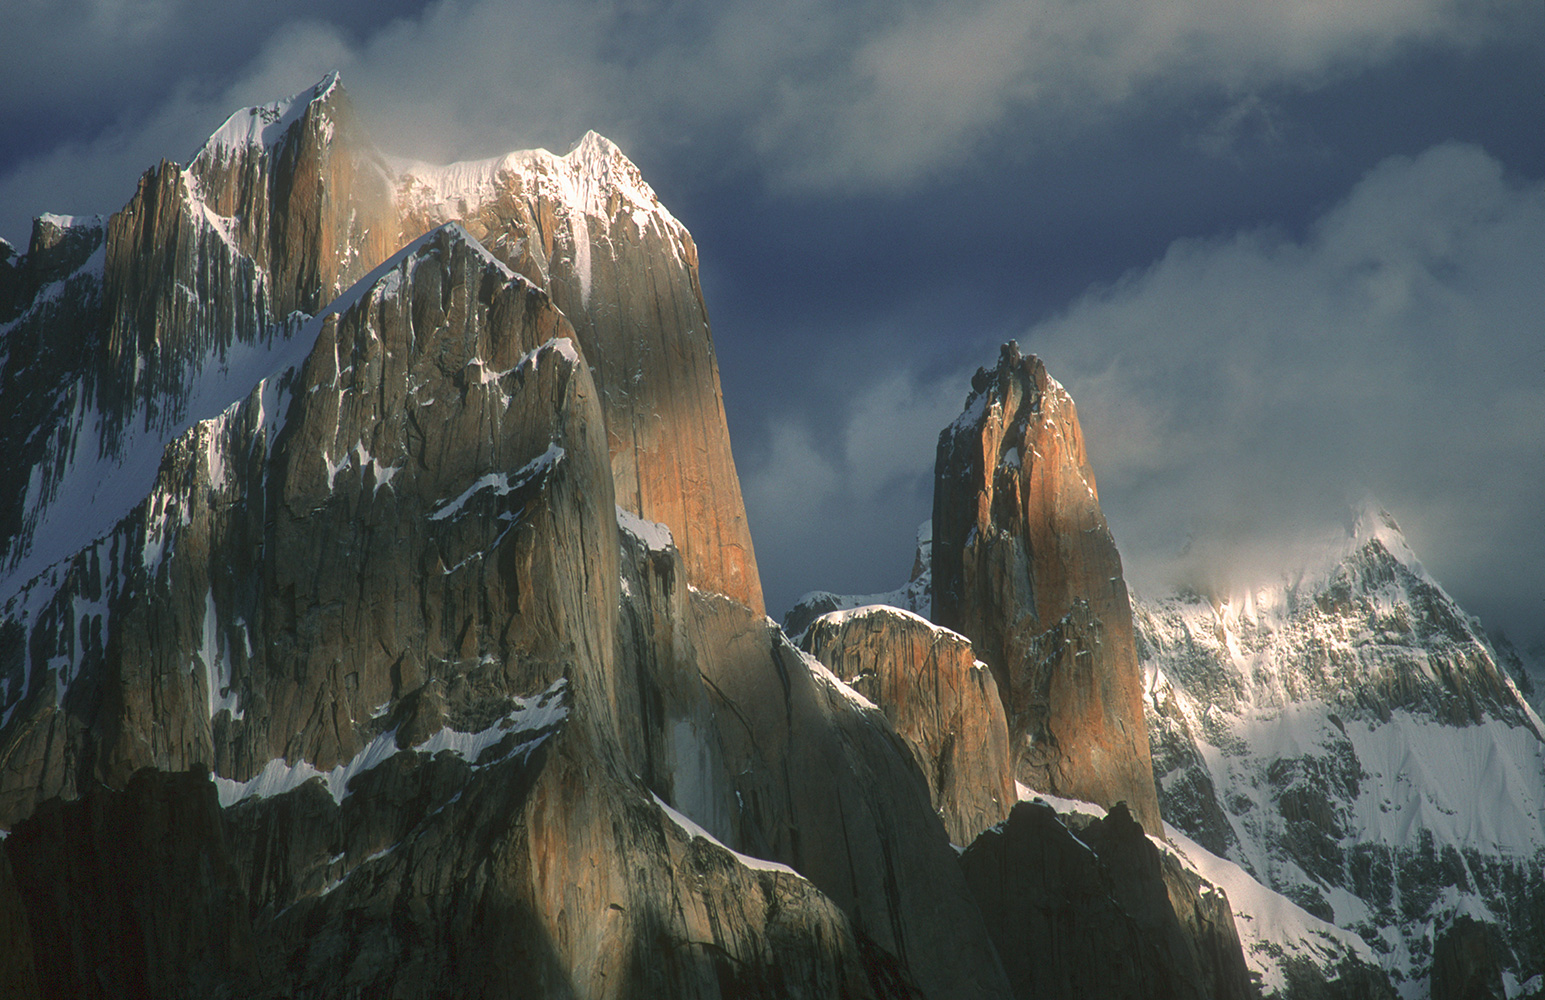 Telephoto from Urdokas on the Baltoro glacier